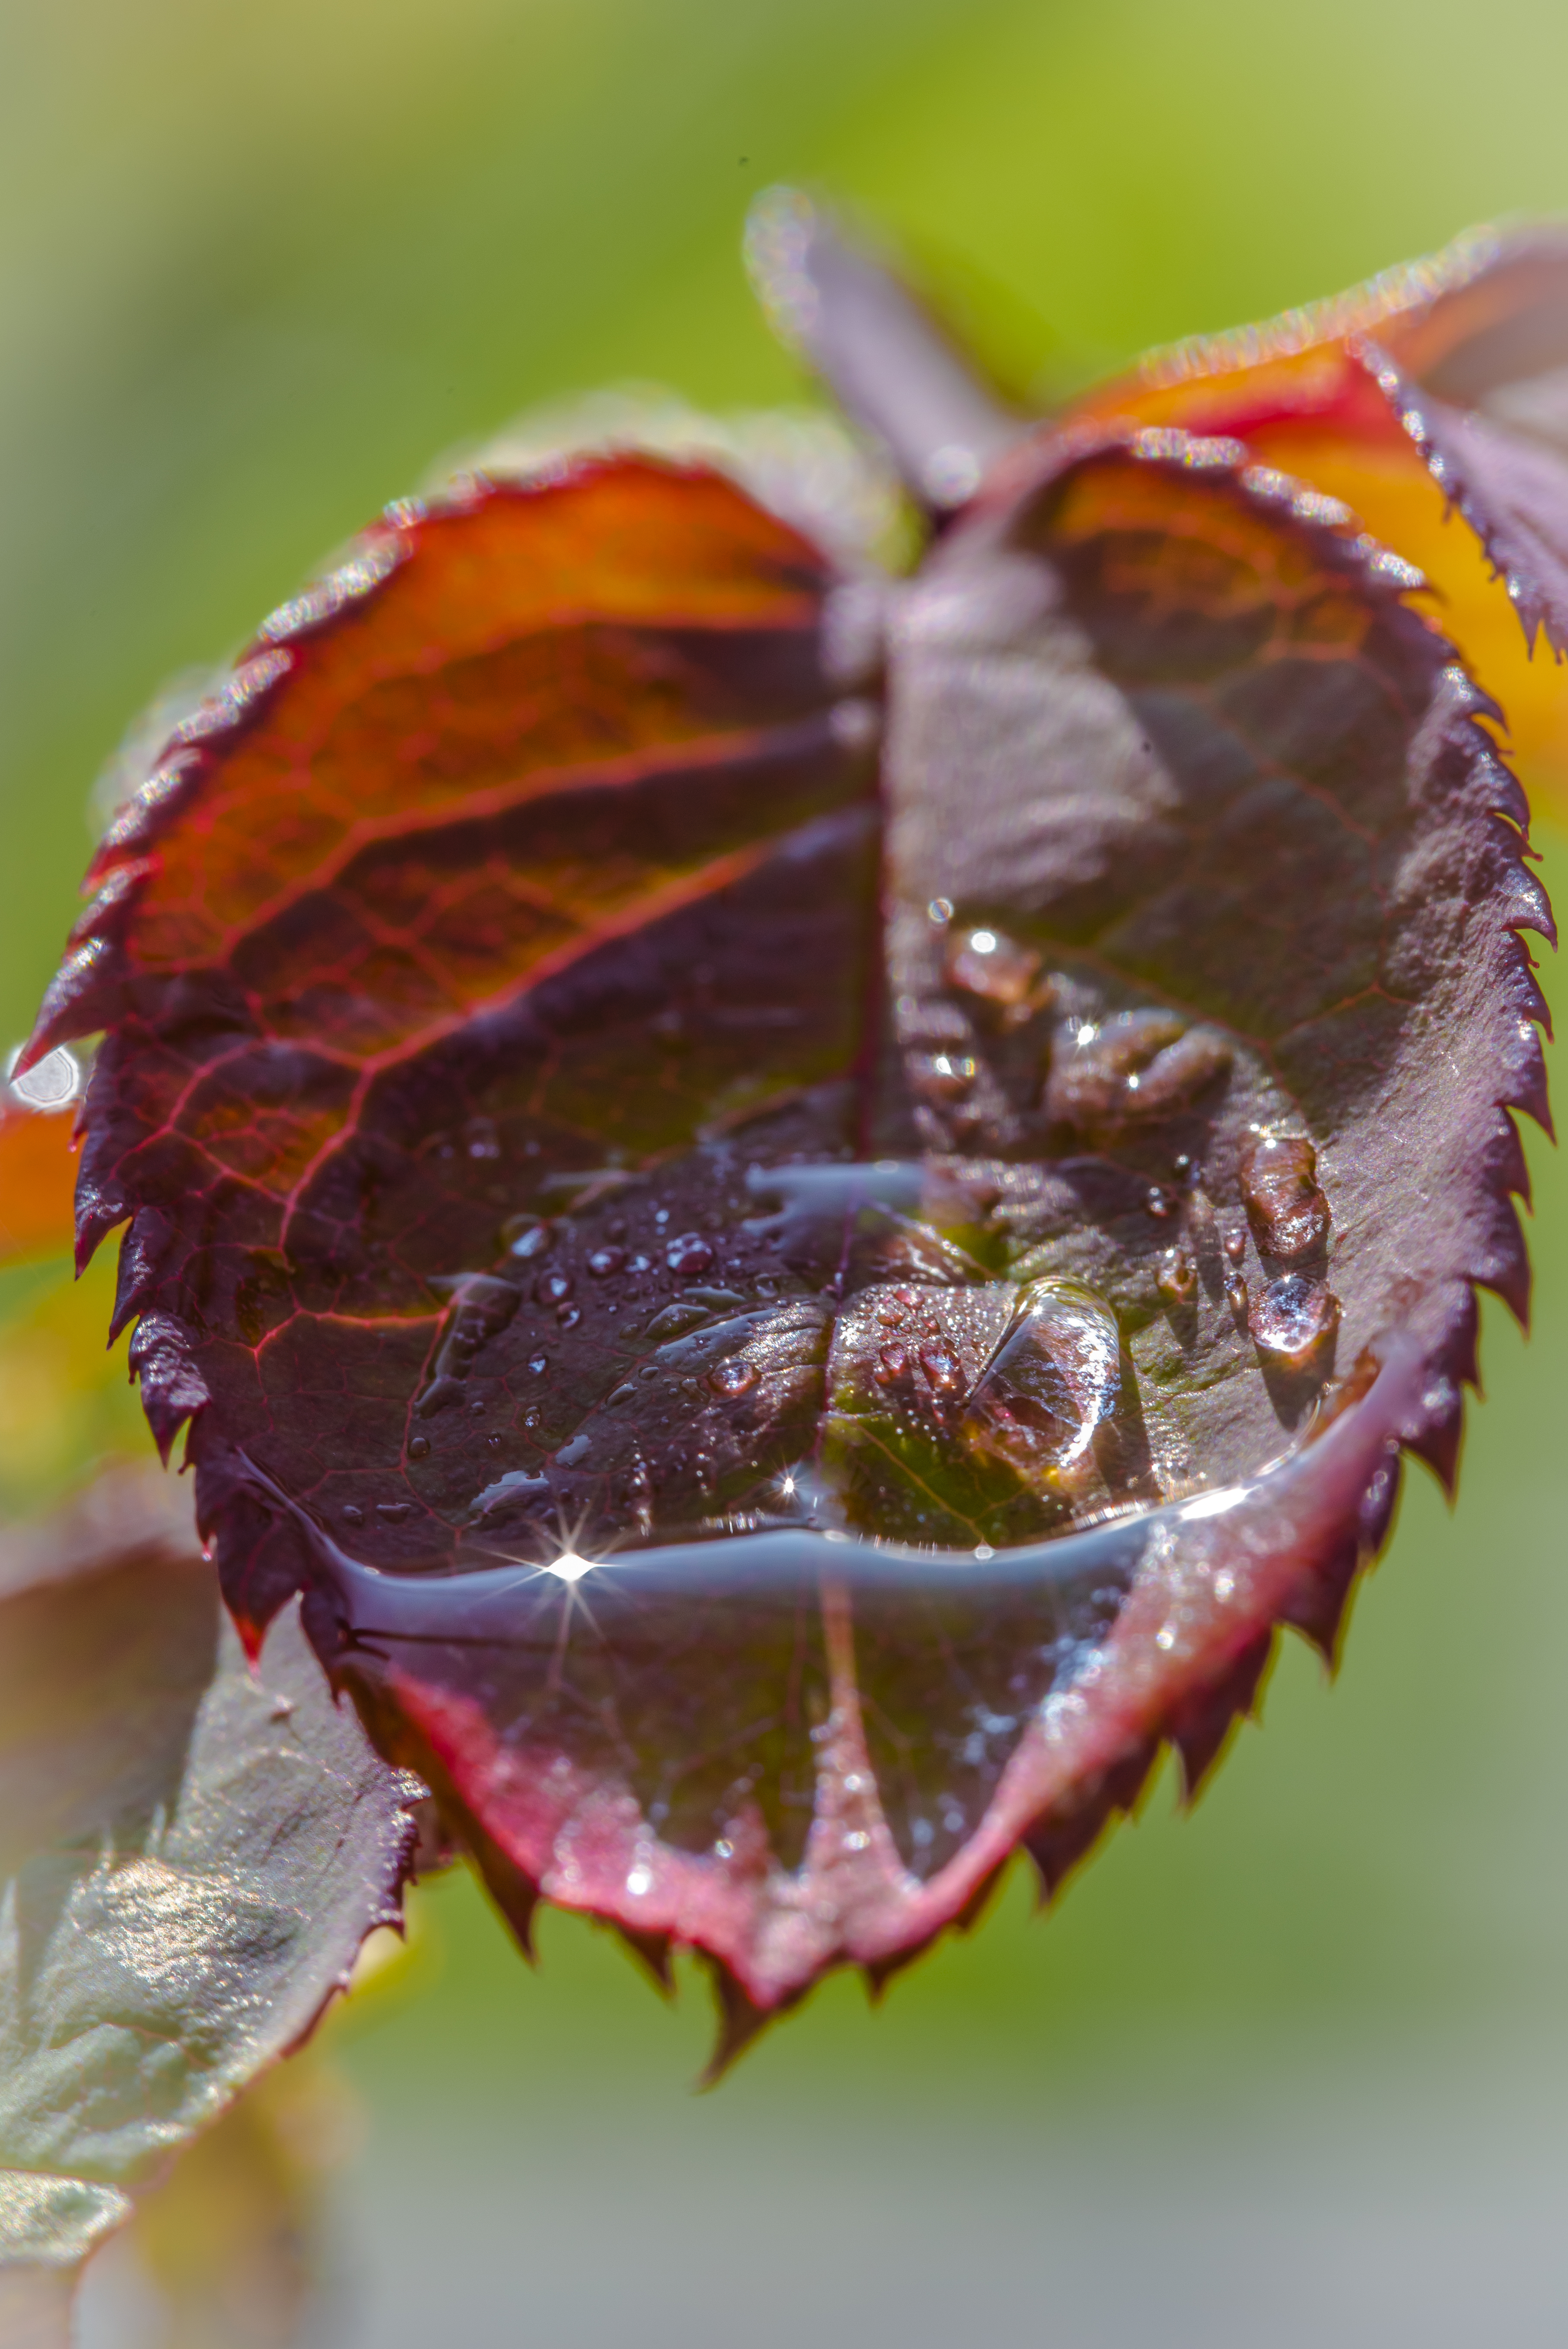 Gartenpflanzen_Tropfen-7